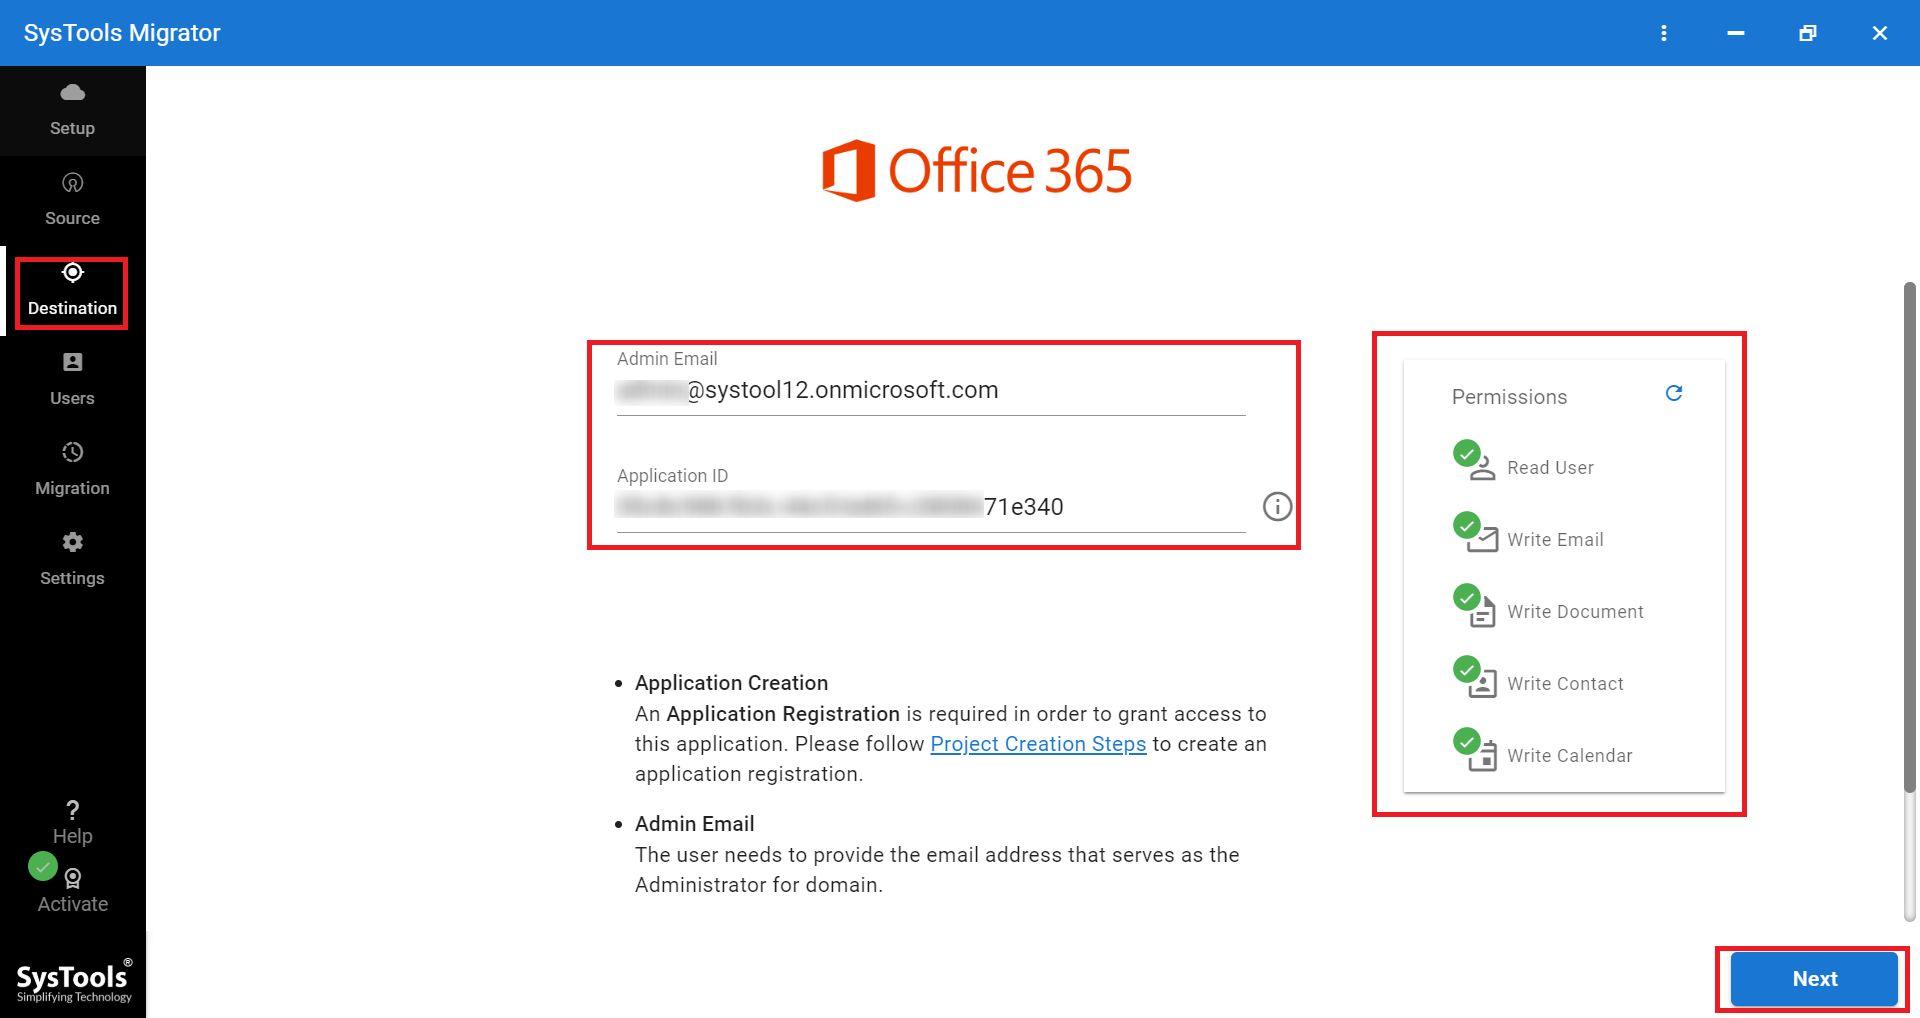 office 365 destination